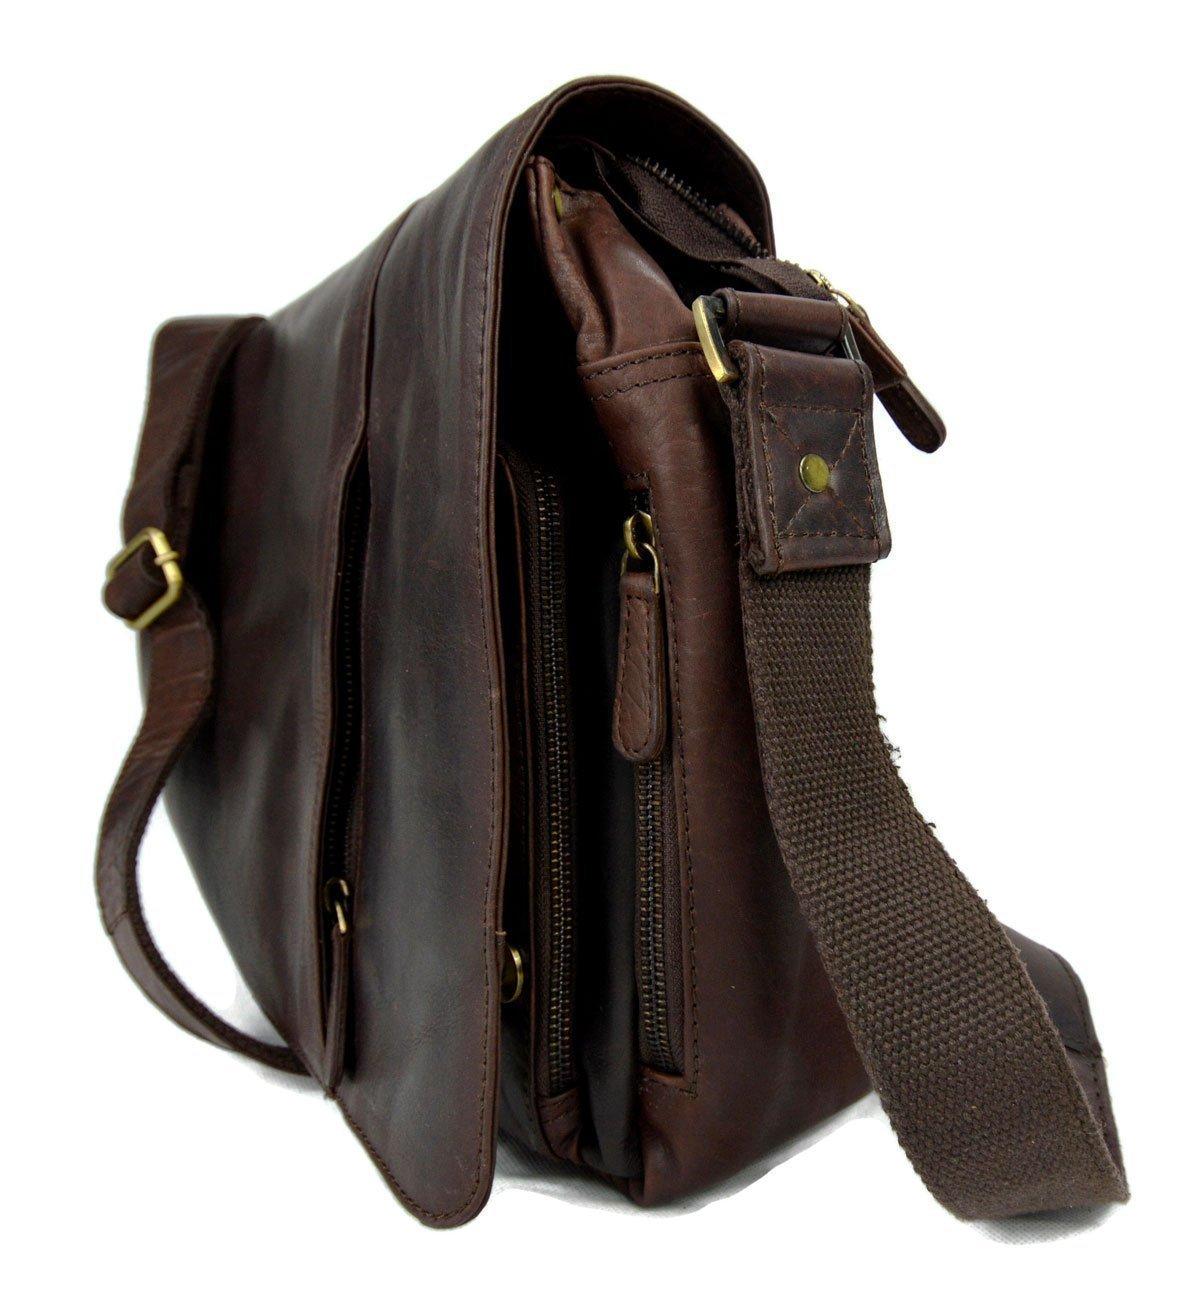 13834a7733 Amazon.com  Genuine italian leather shoulder messenger bag ipad laptop  ladies men notebook leatherbag satchel dark brown crossbody business  executive  ...